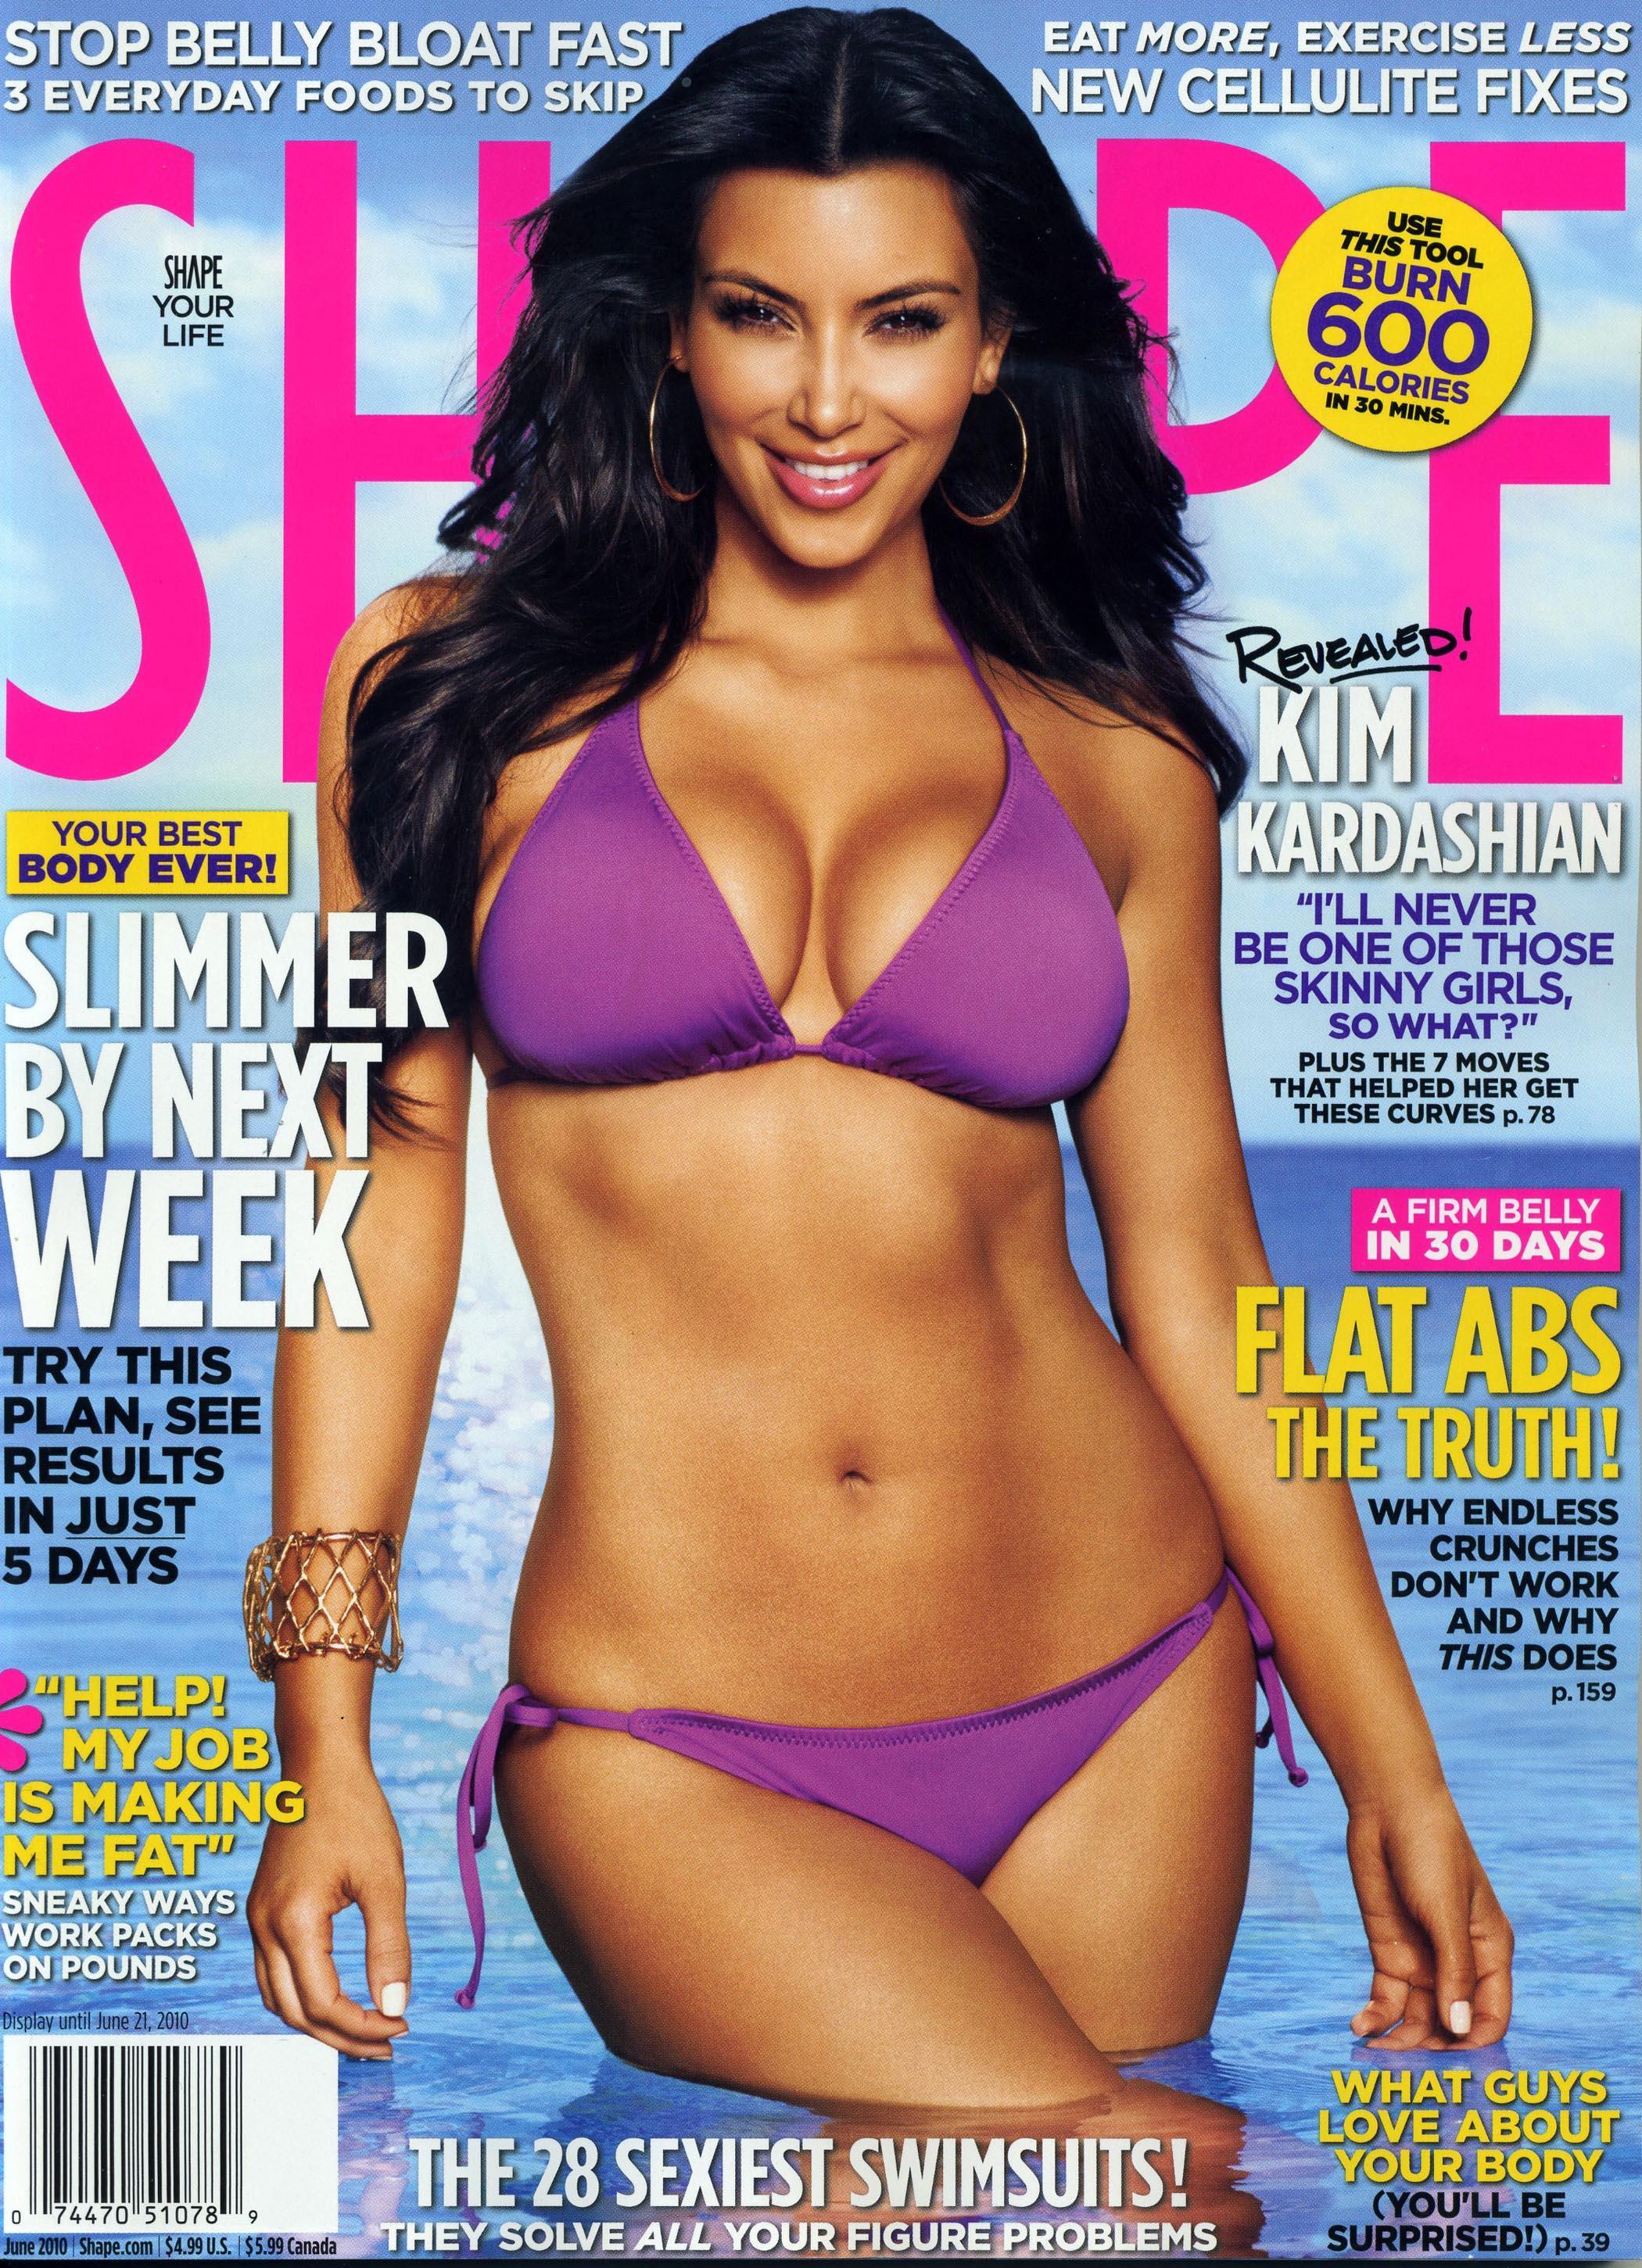 Kim Kardashian 2010 : kim-kardashian-cover-for-shape-magazine-june-2010-issue-scan-01